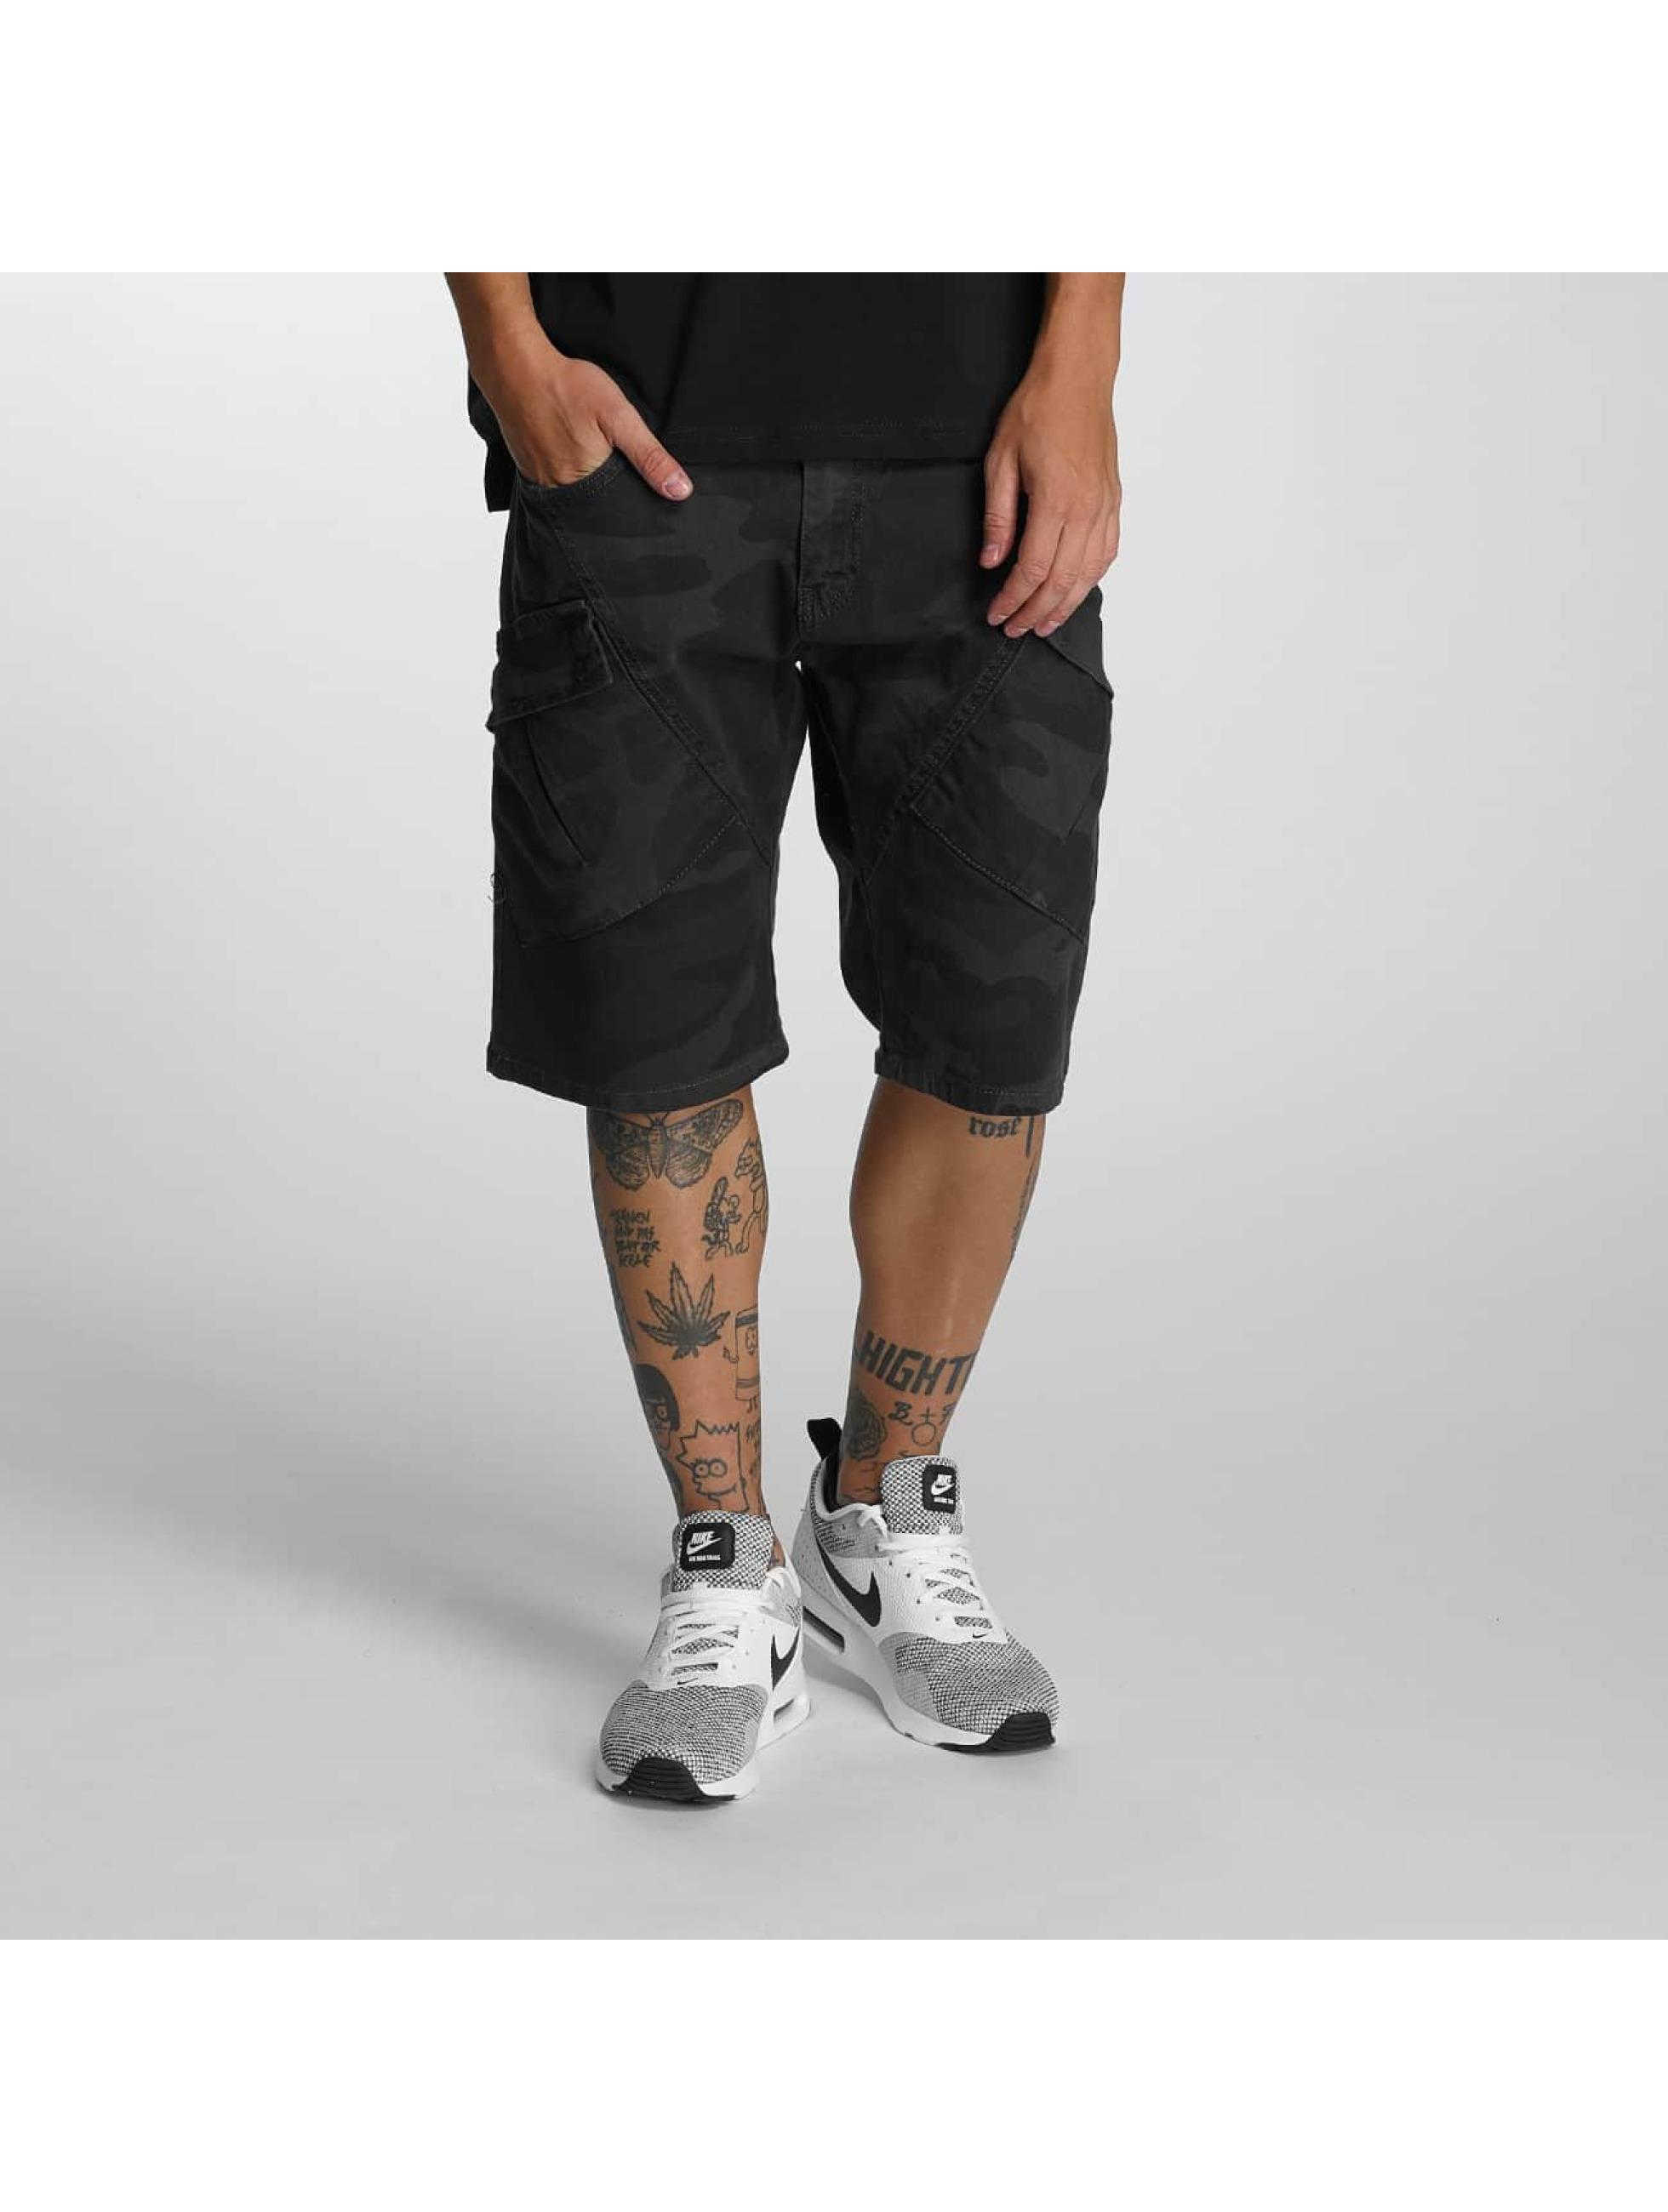 Bangastic-Uomini-Pantaloni-Shorts-Camou